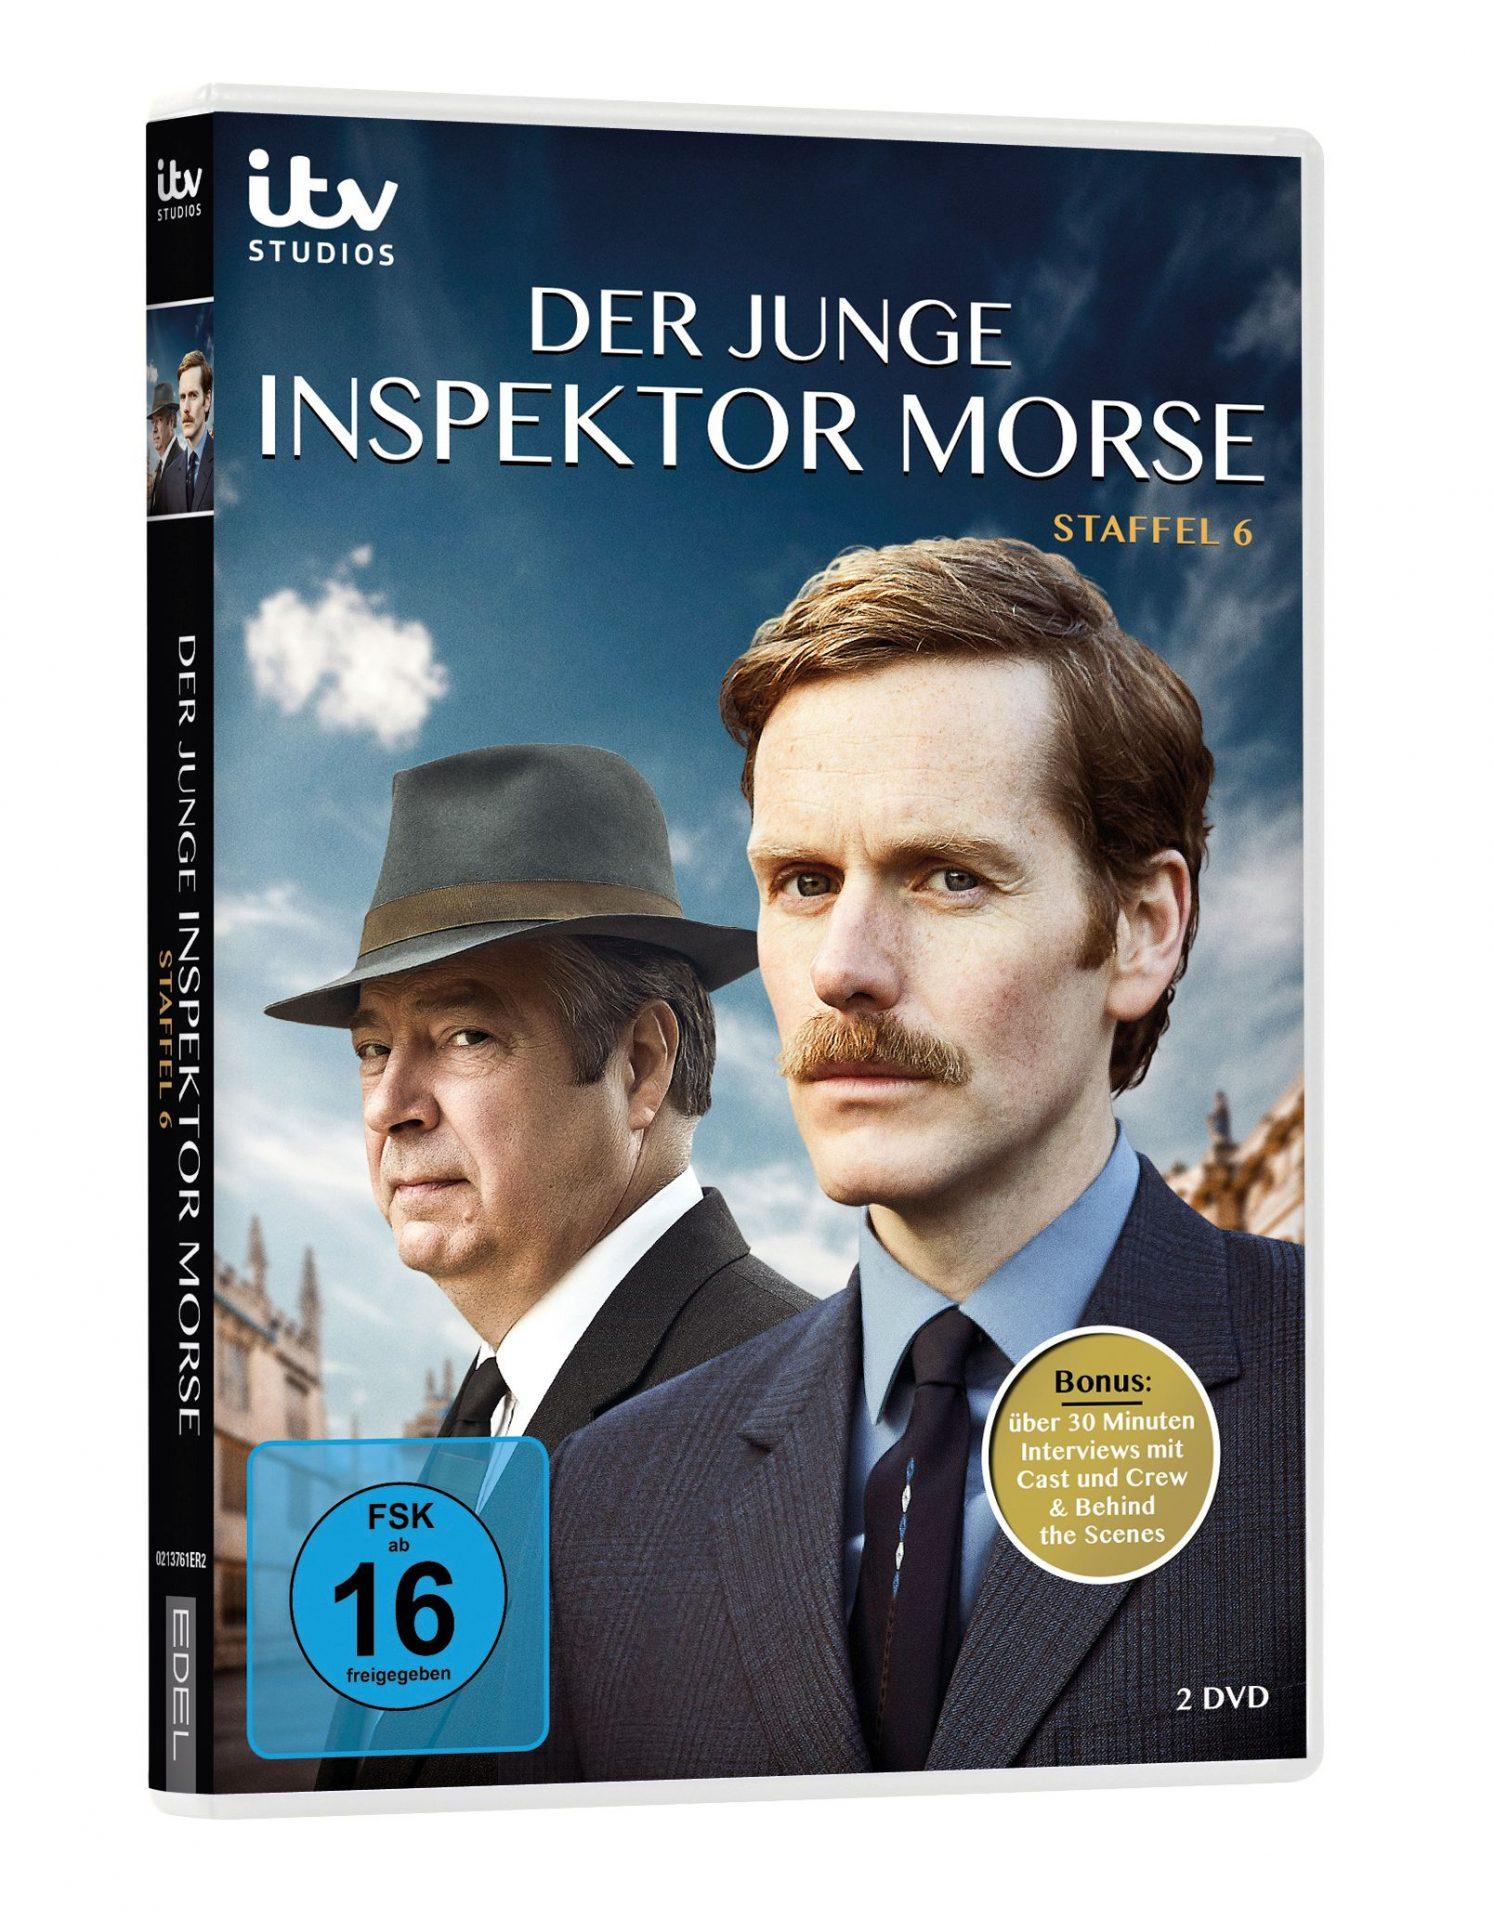 Der junge Inspektor Morse Staffel 6